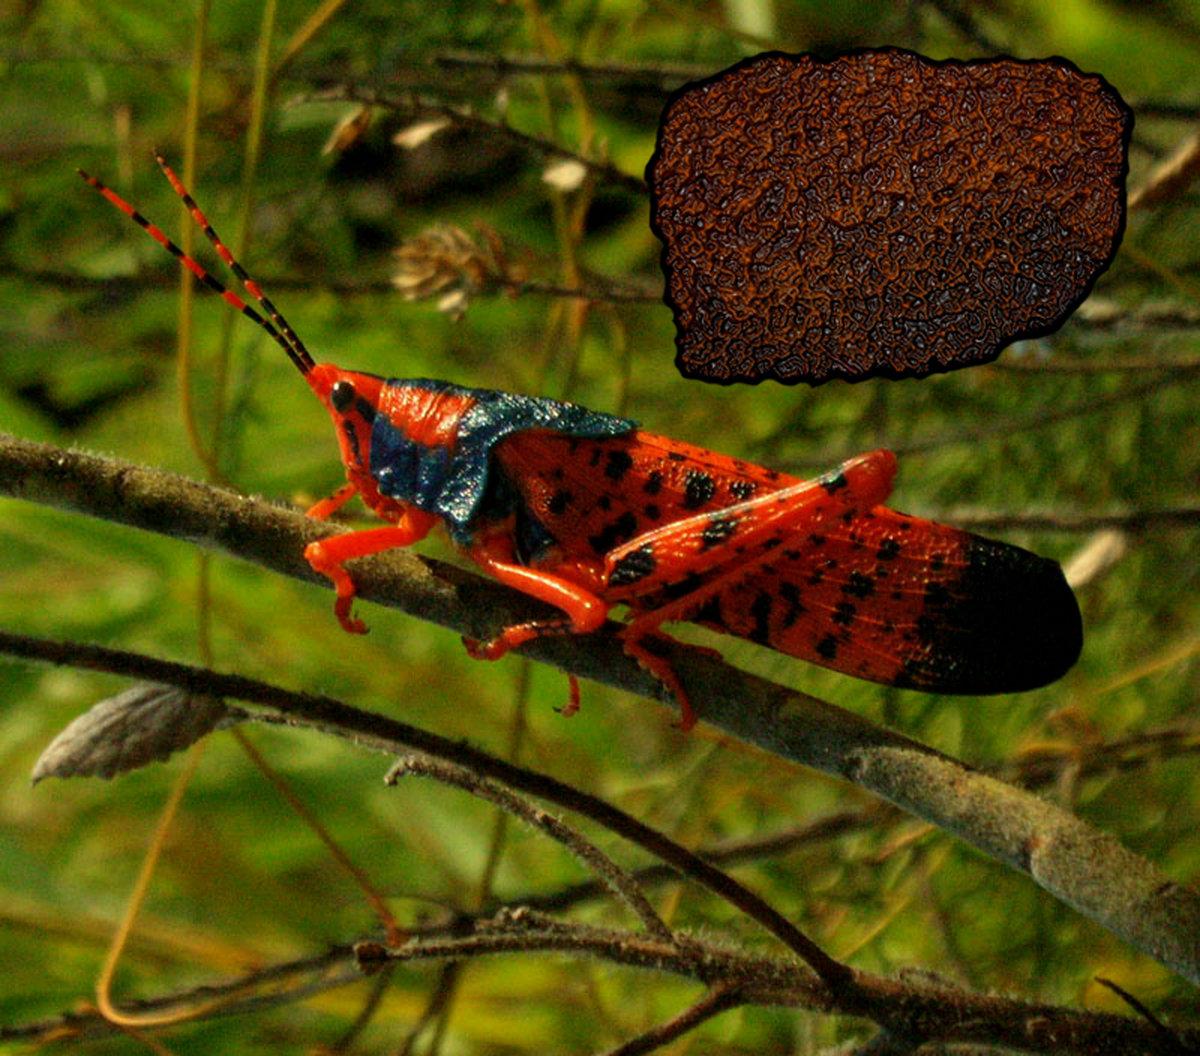 Carbonized Grasshopper noise | NECROTIC TISSUE vomit